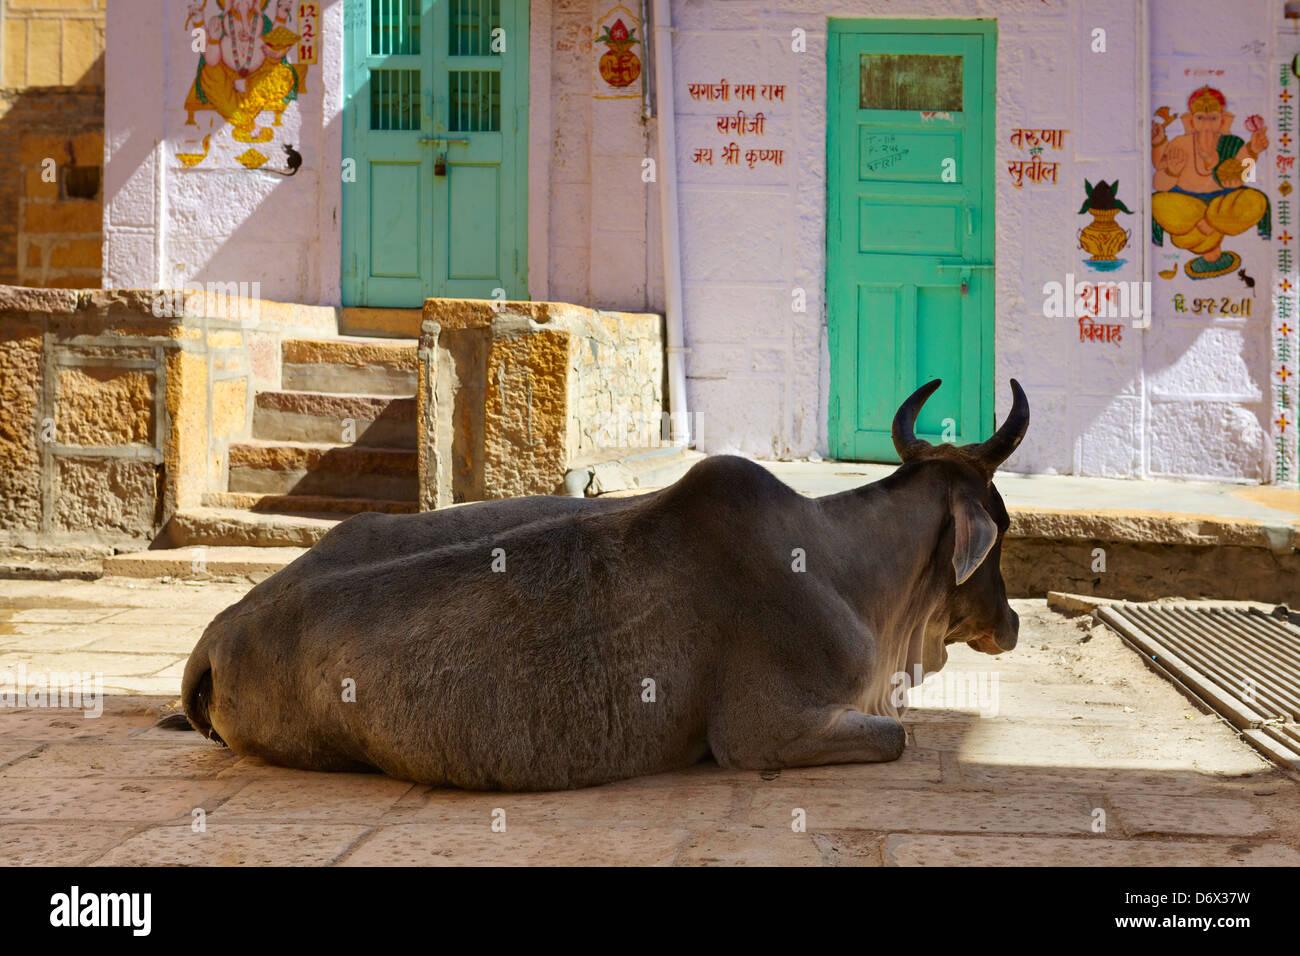 Scène de rue, vache sur la rue, Jaisalmer, Rajasthan, India Photo Stock